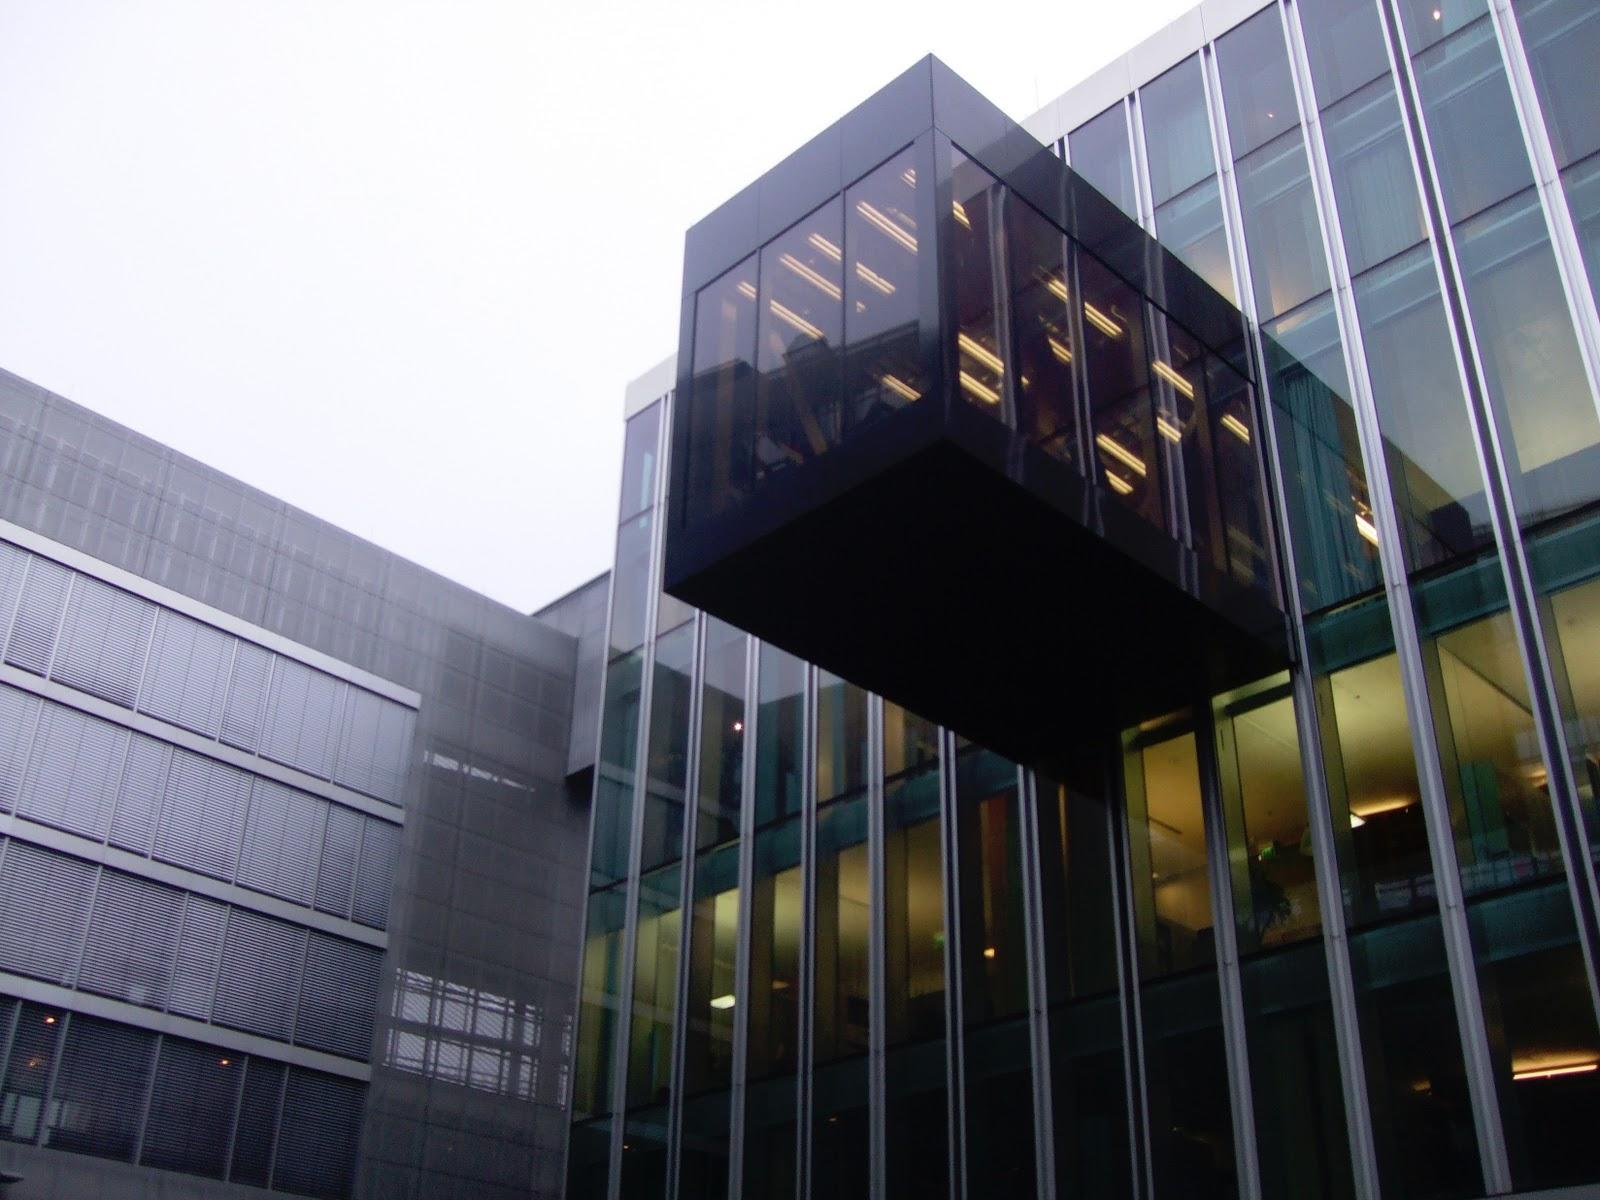 Najpoznatije svetske arhitekte OMAEmbassyBerlinExteriorB_LukeButcherCopyright